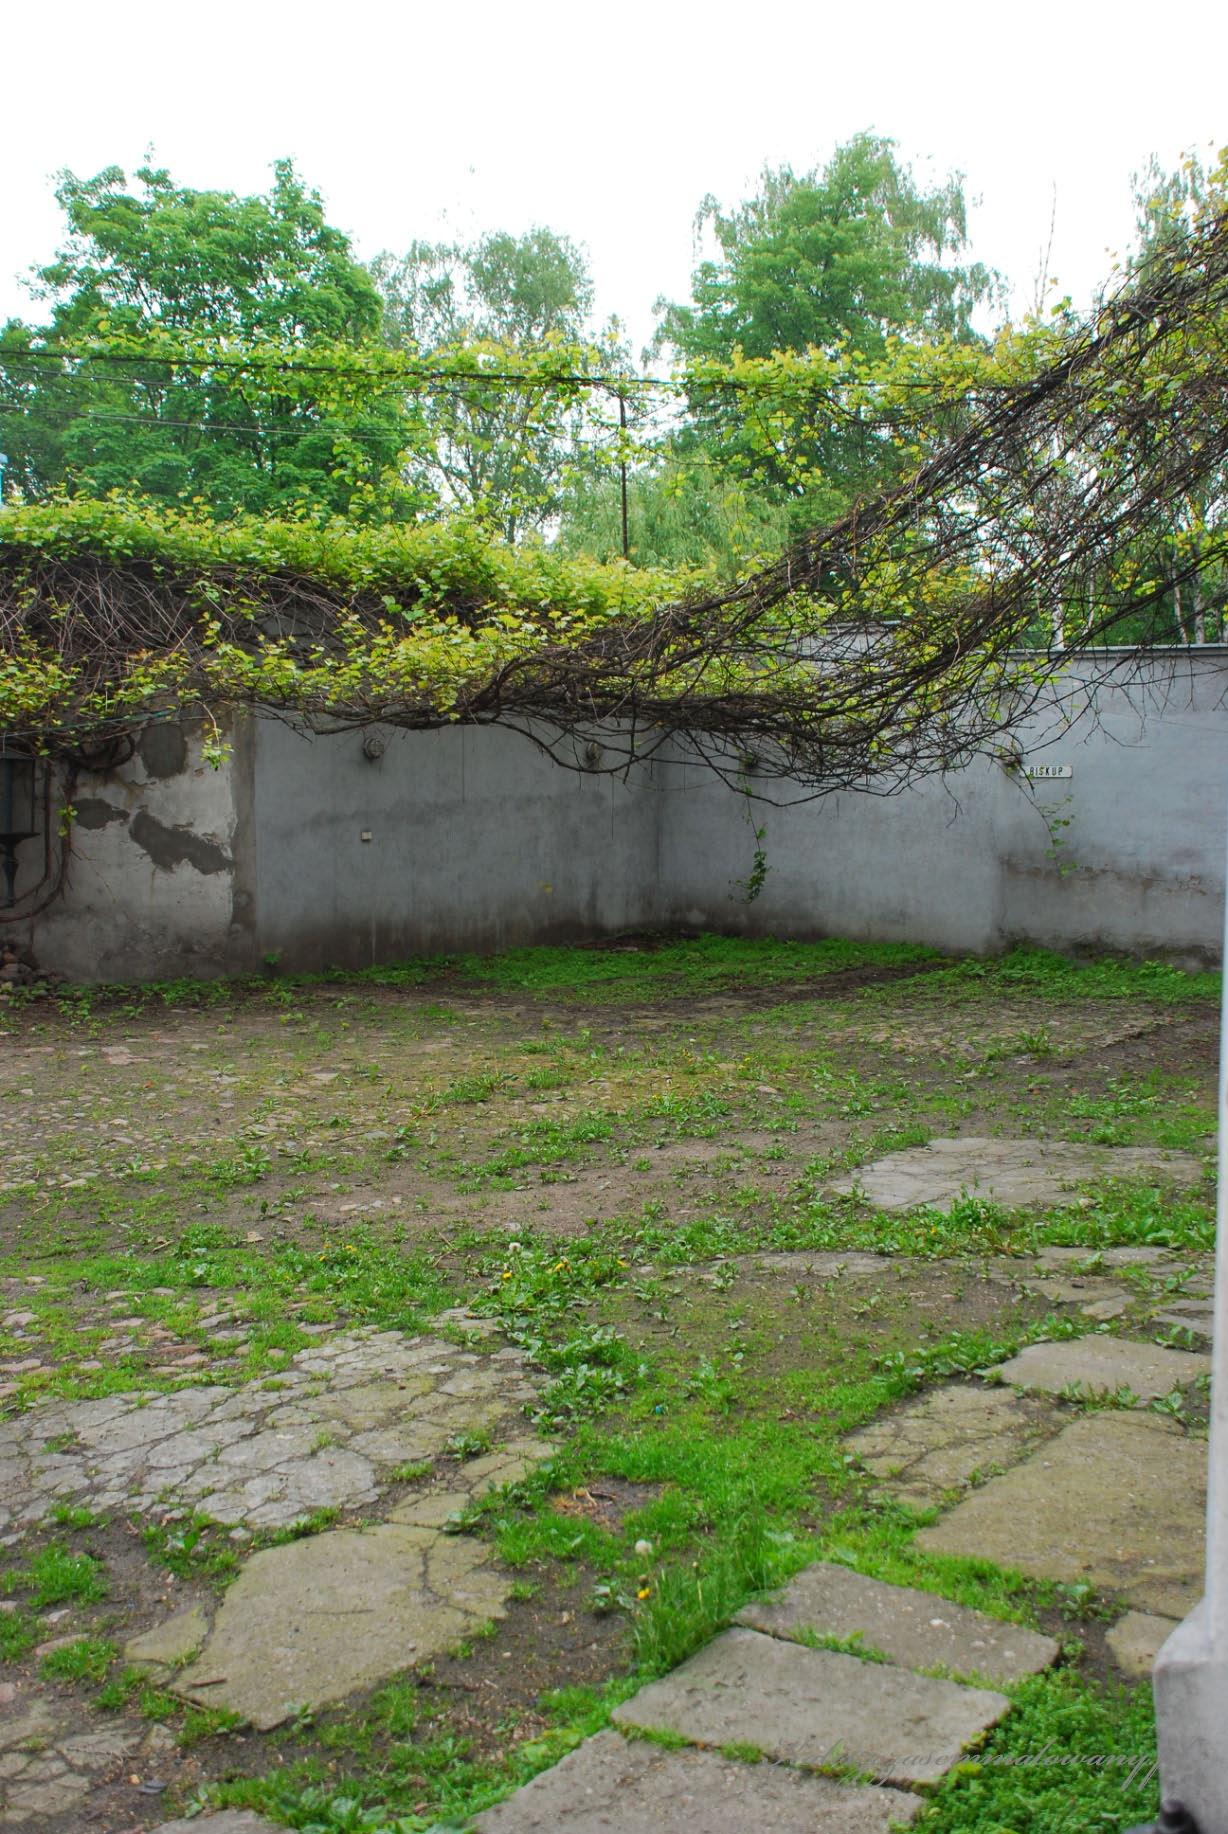 Dom_pod_anilolami-20